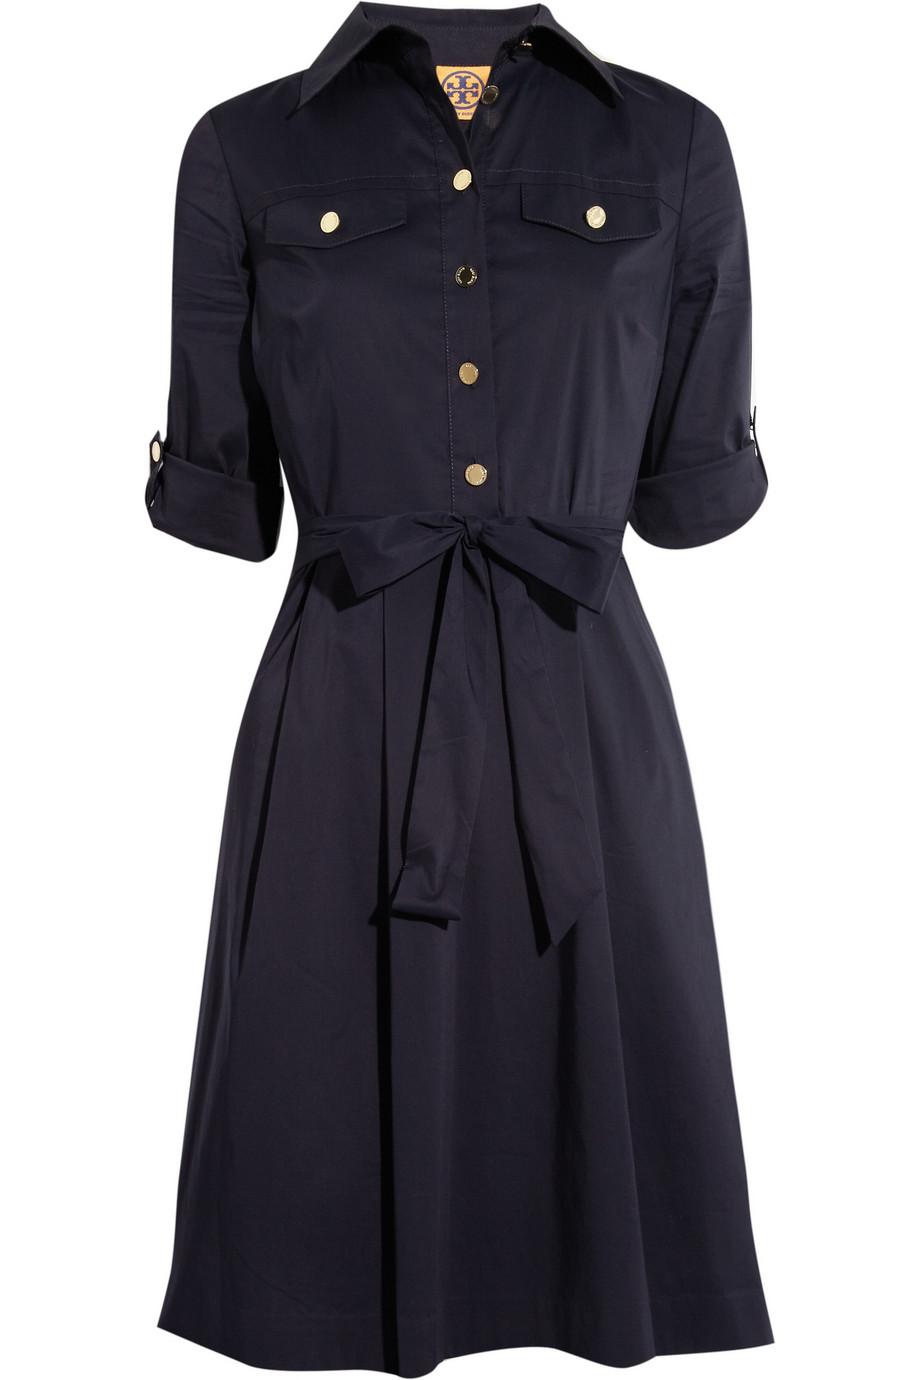 Lyst tory burch blythe stretch cottonblend shirt dress for How to stretch a dress shirt